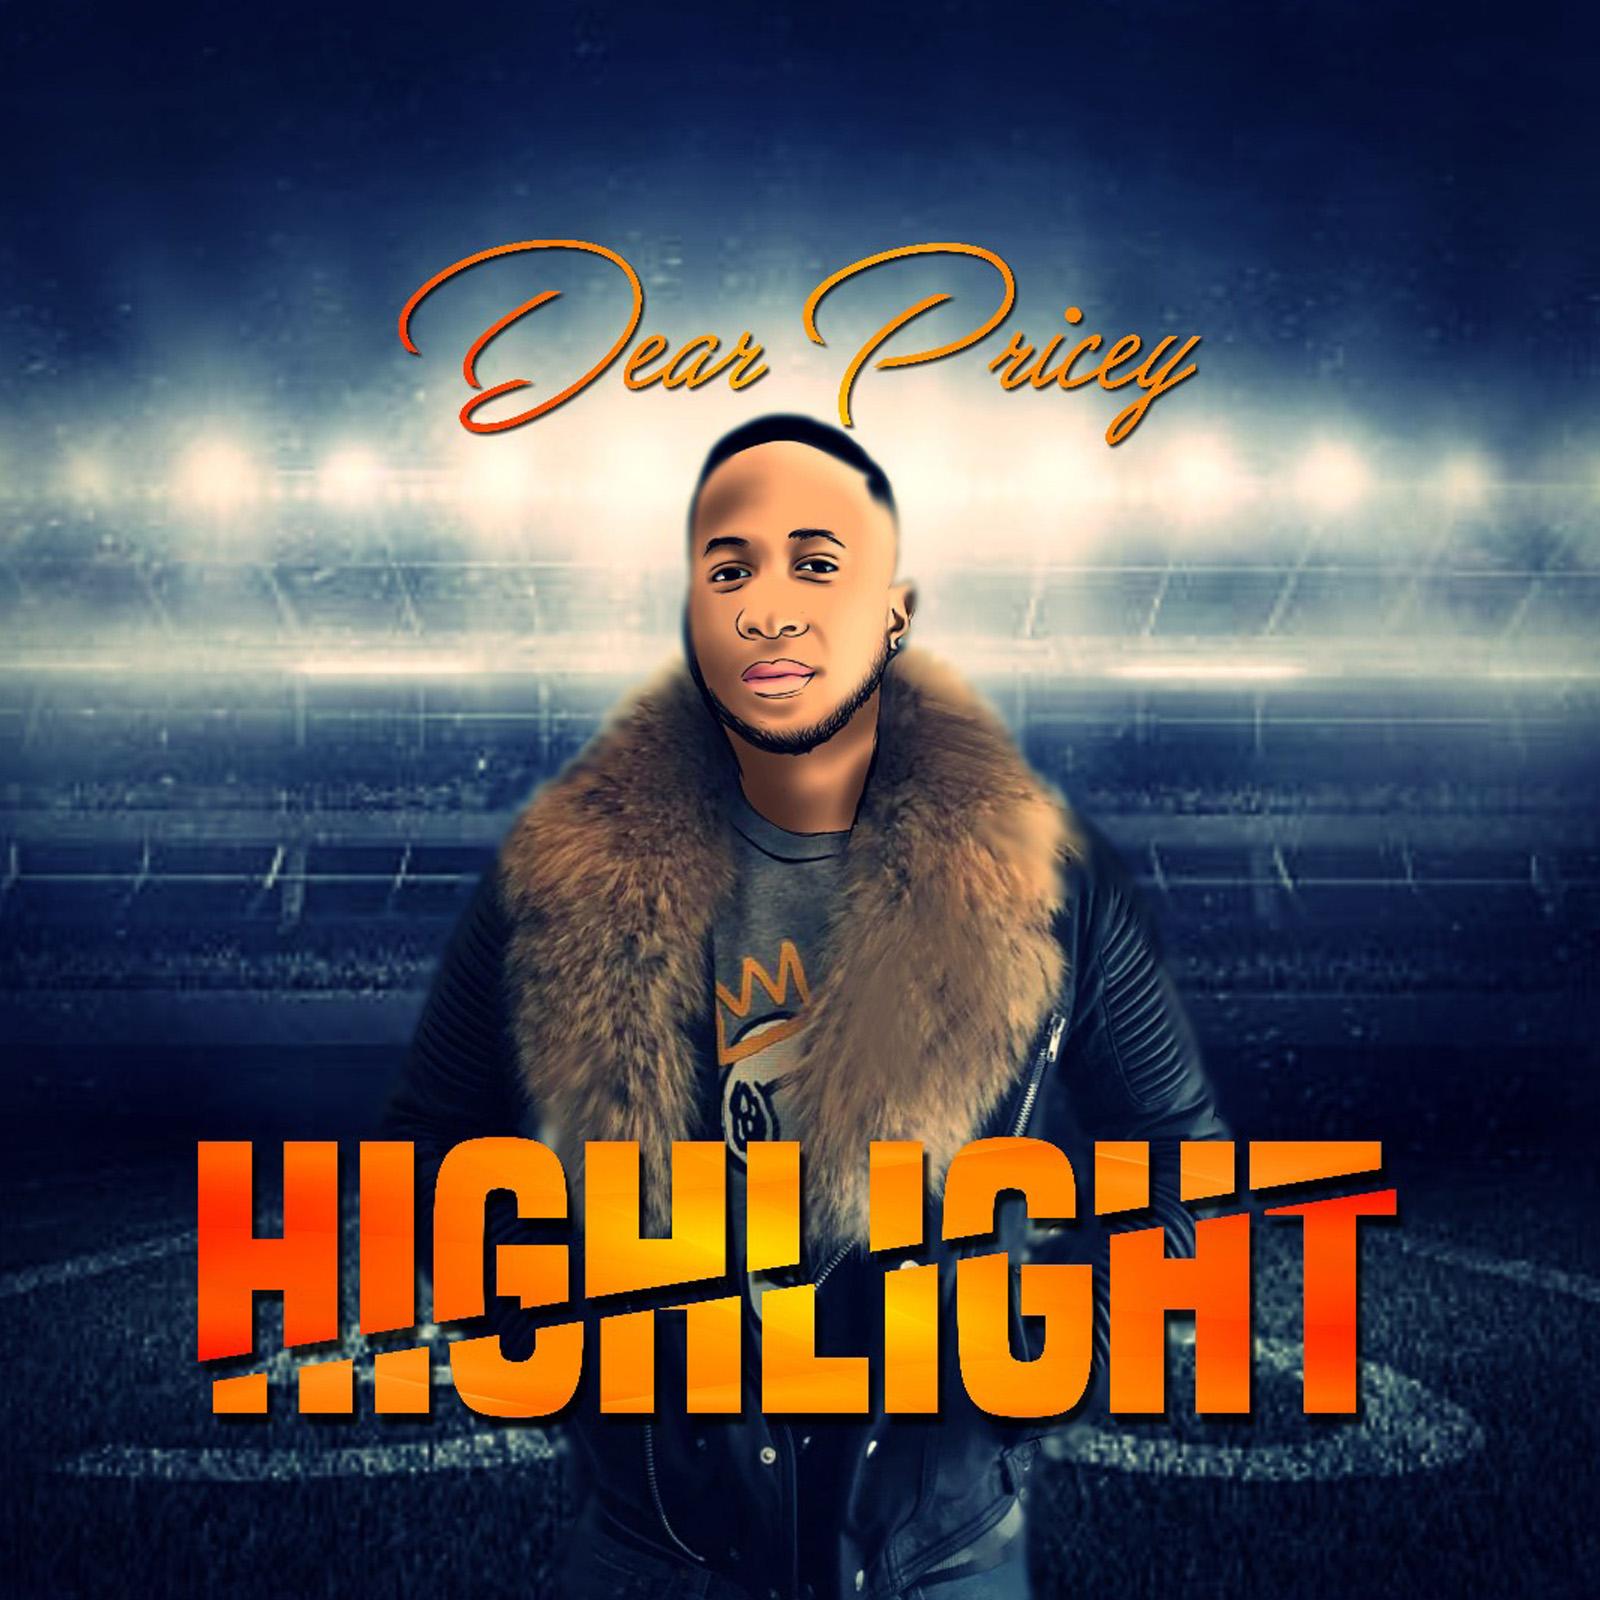 Dear Pricey - Highlight